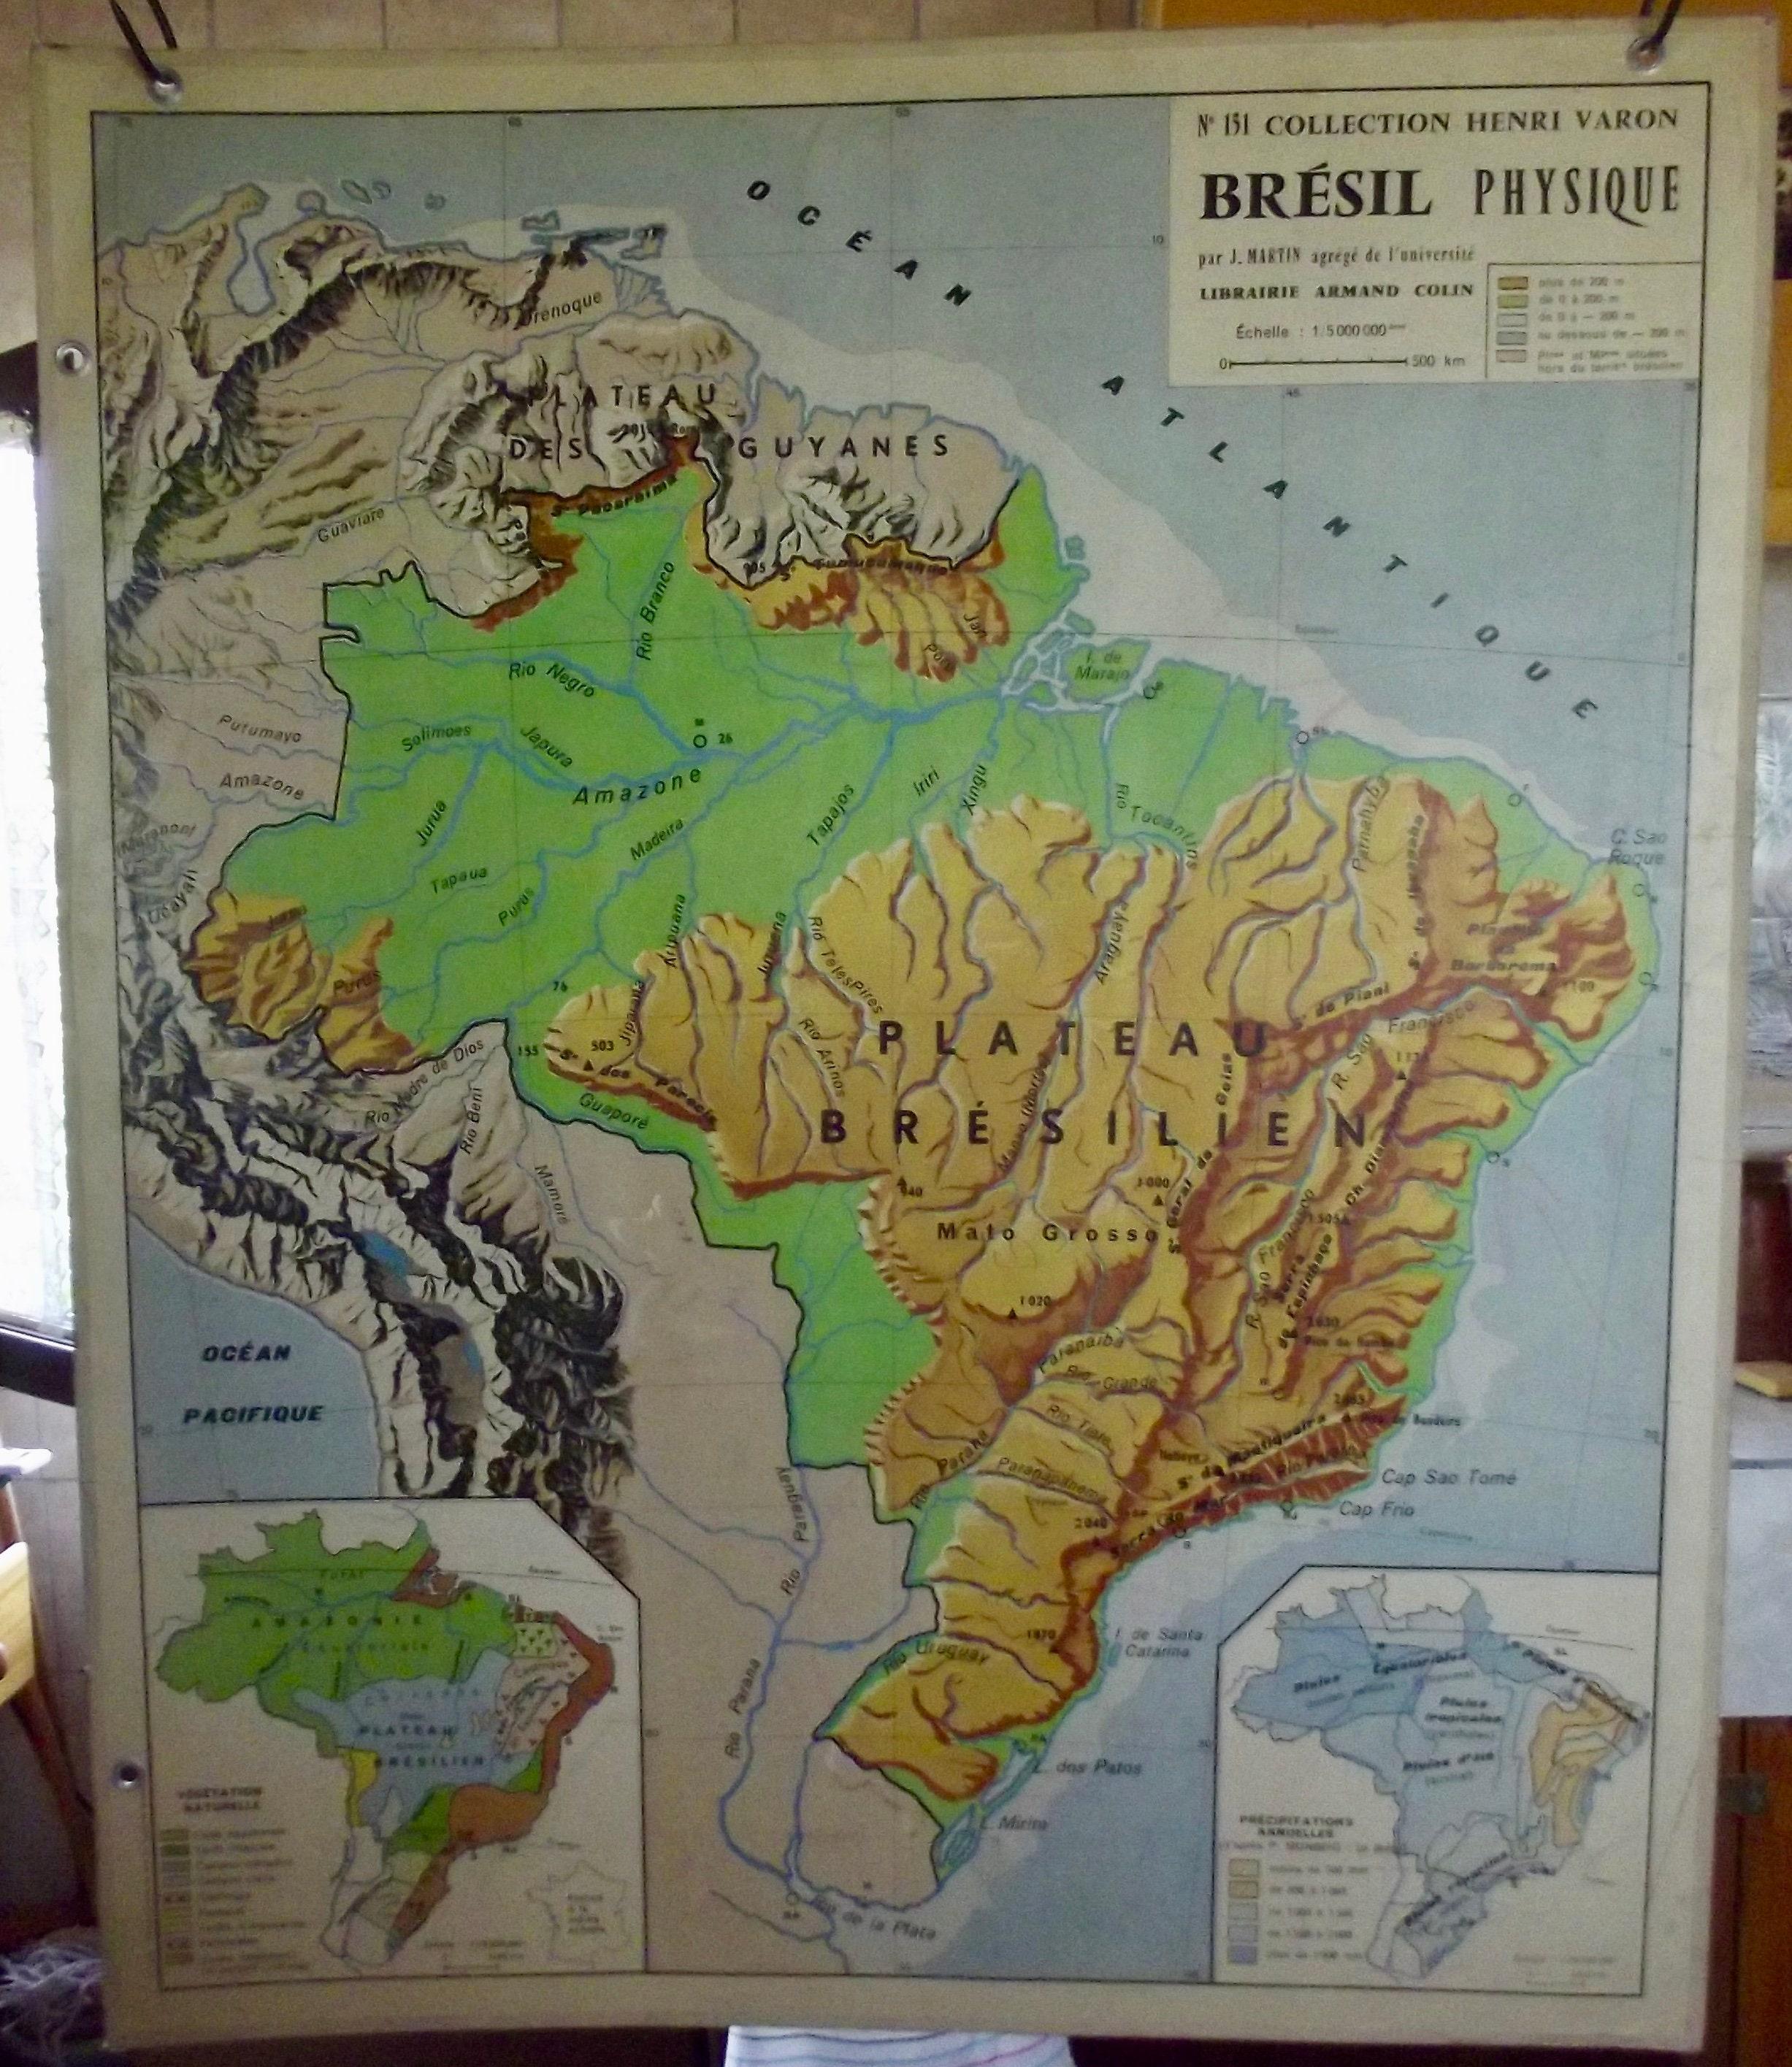 Old school map 151 Collection Henri Varon Brazil Armand Colin Guyana  Amazonian Brazilian Plateau Sao Paulo Rio de Janeiro Recife